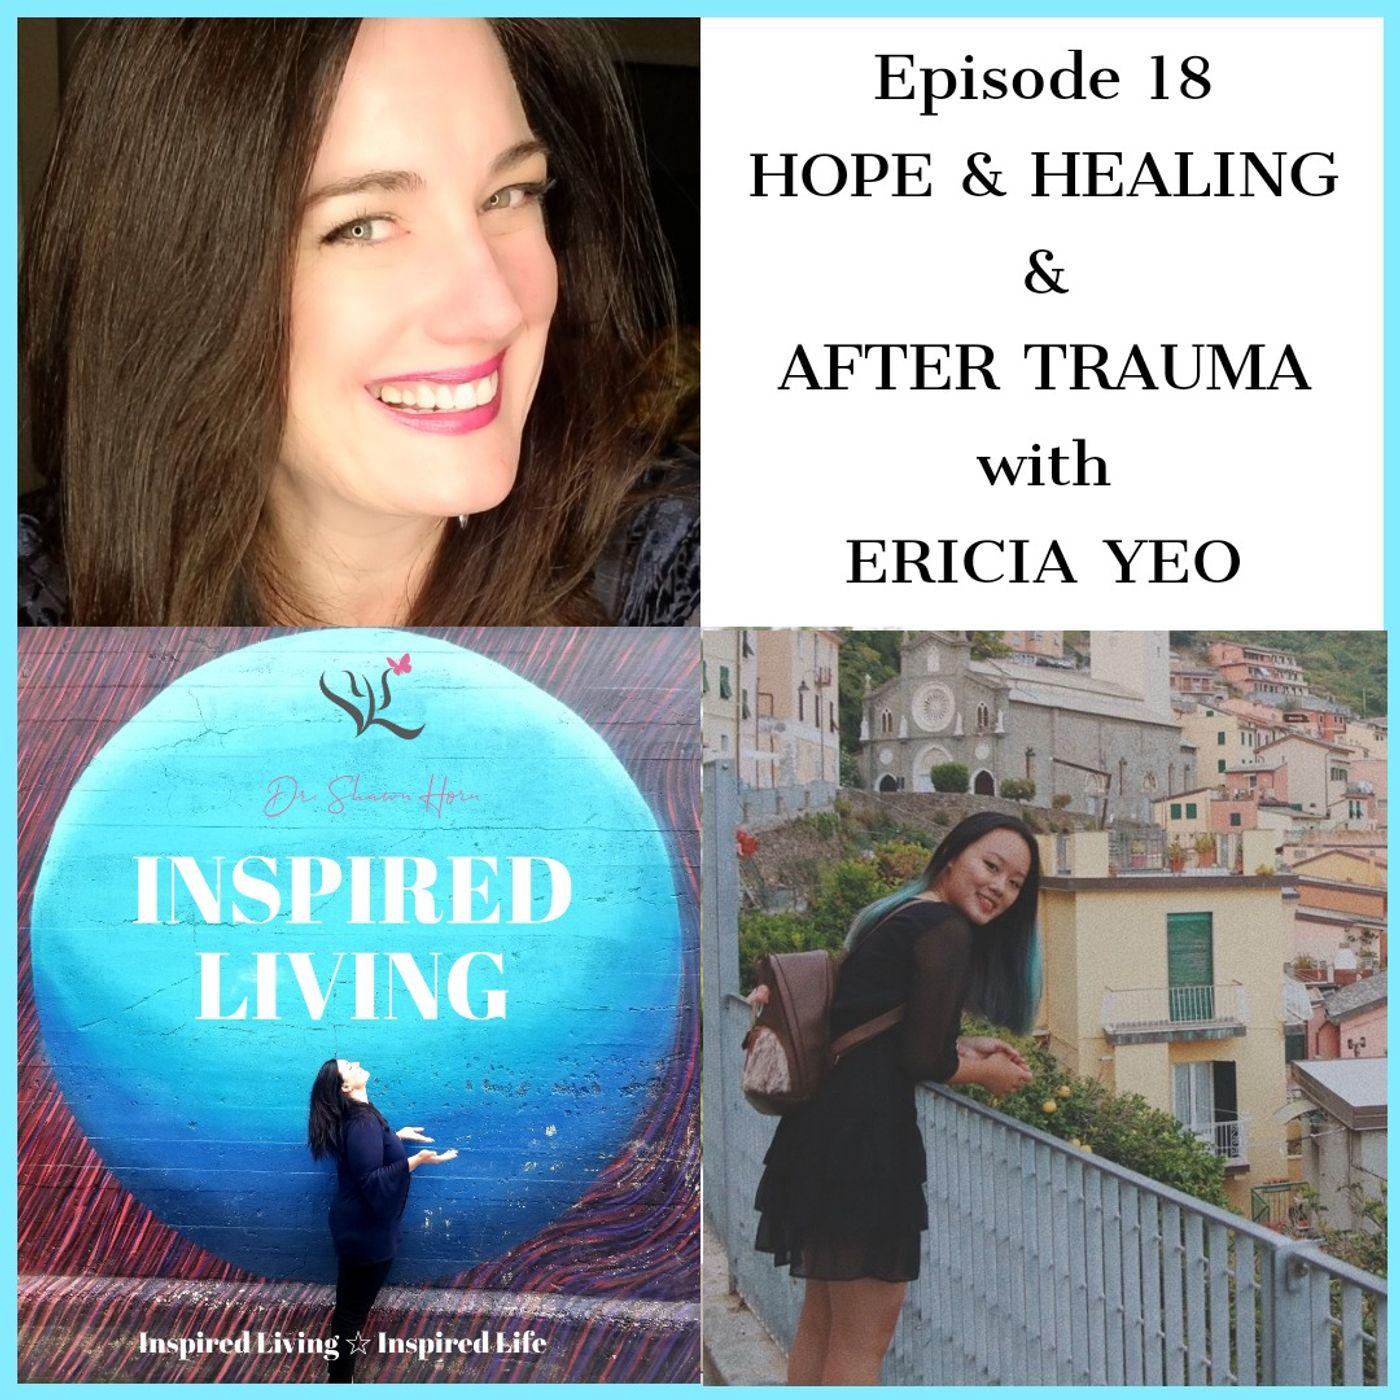 Hope & Healing After Trauma with Trauma Specialist Ericia Yeo